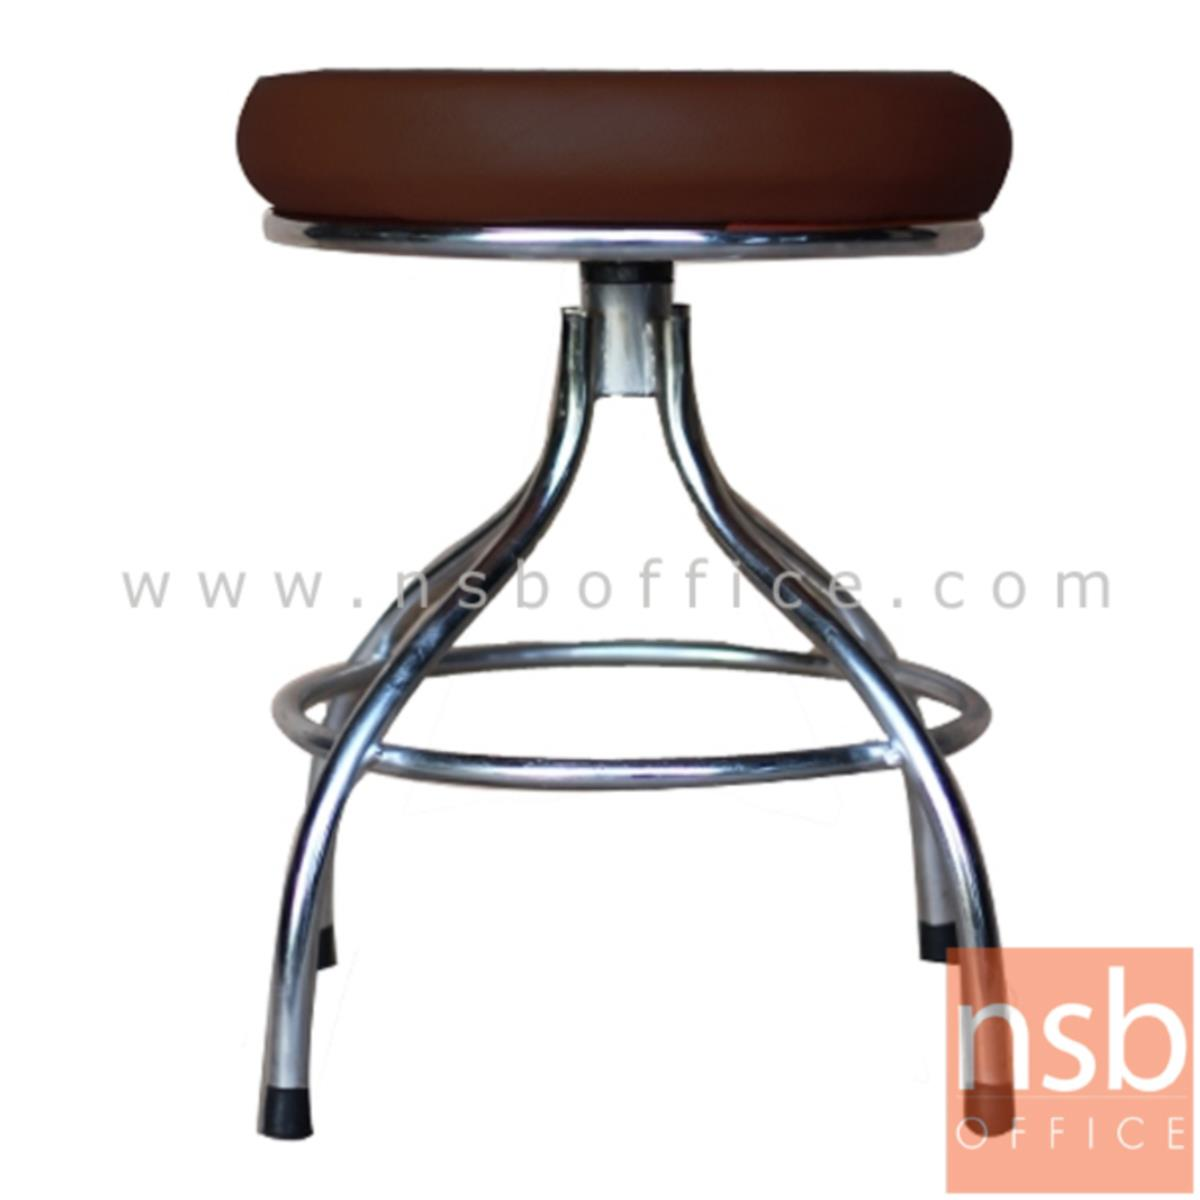 B09A102:เก้าอี้บาร์สตูลที่นั่งกลม รุ่น Whitley (วิทลีย์)  ขาทรงถ้วยชุบโครเมี่ยม